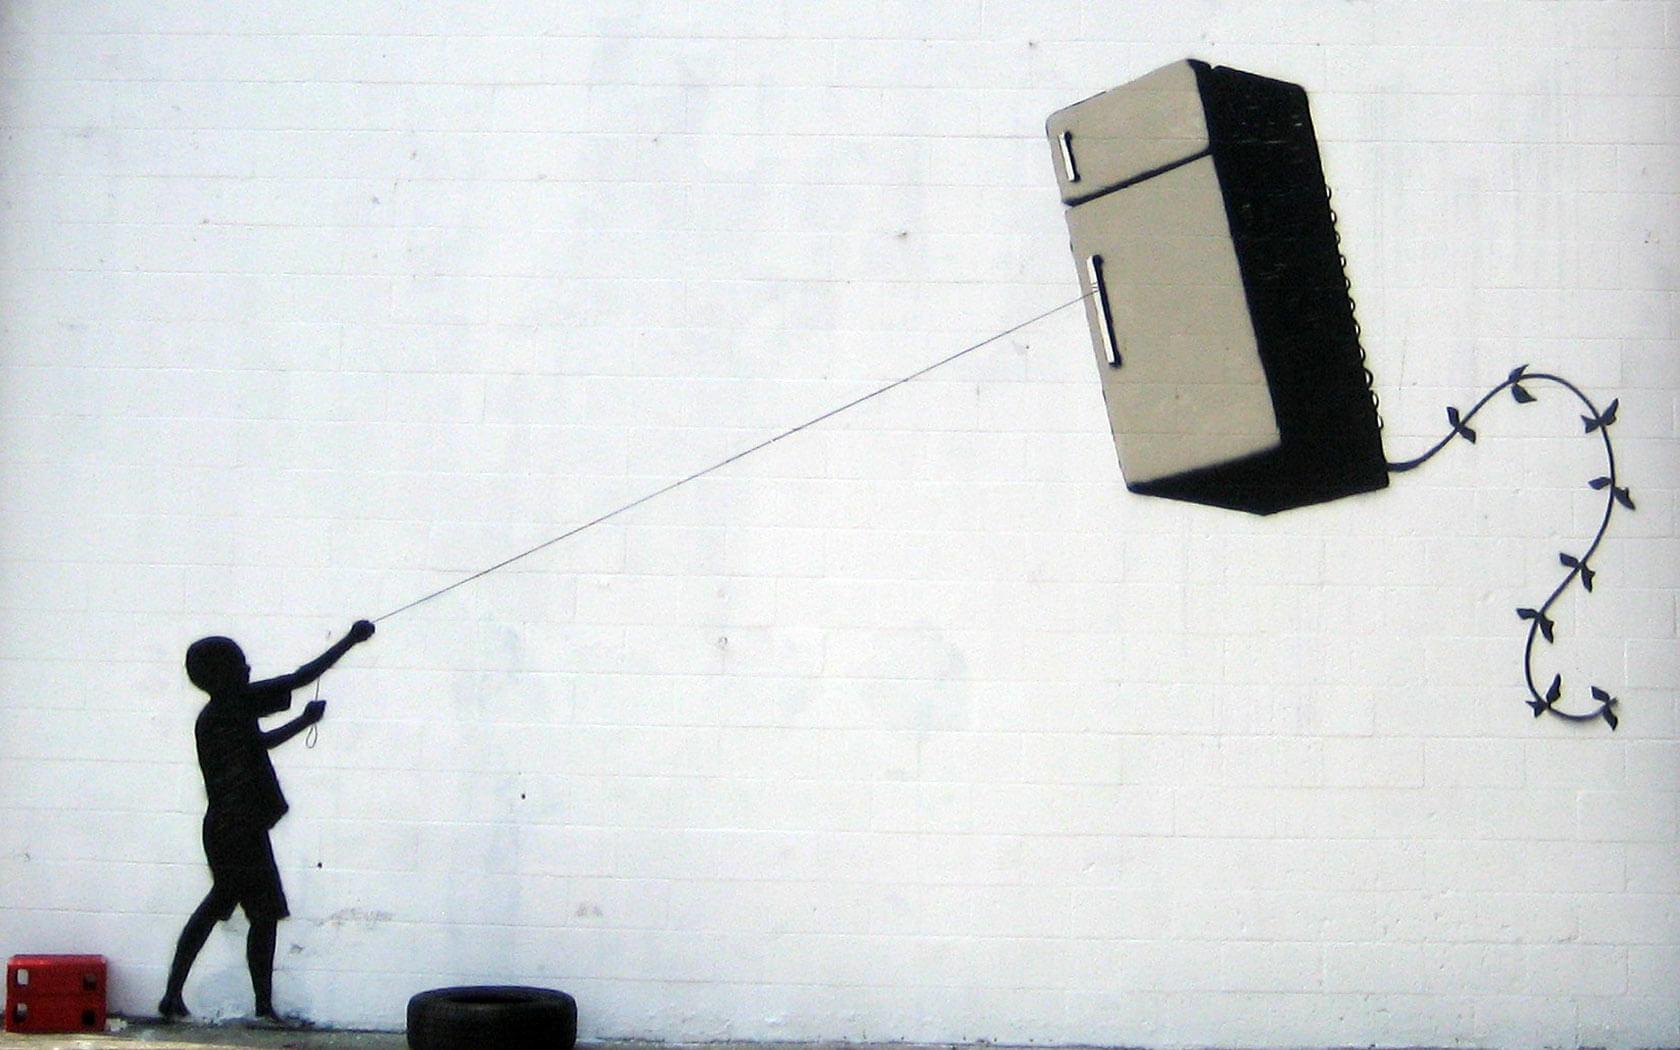 banksy - photo #23